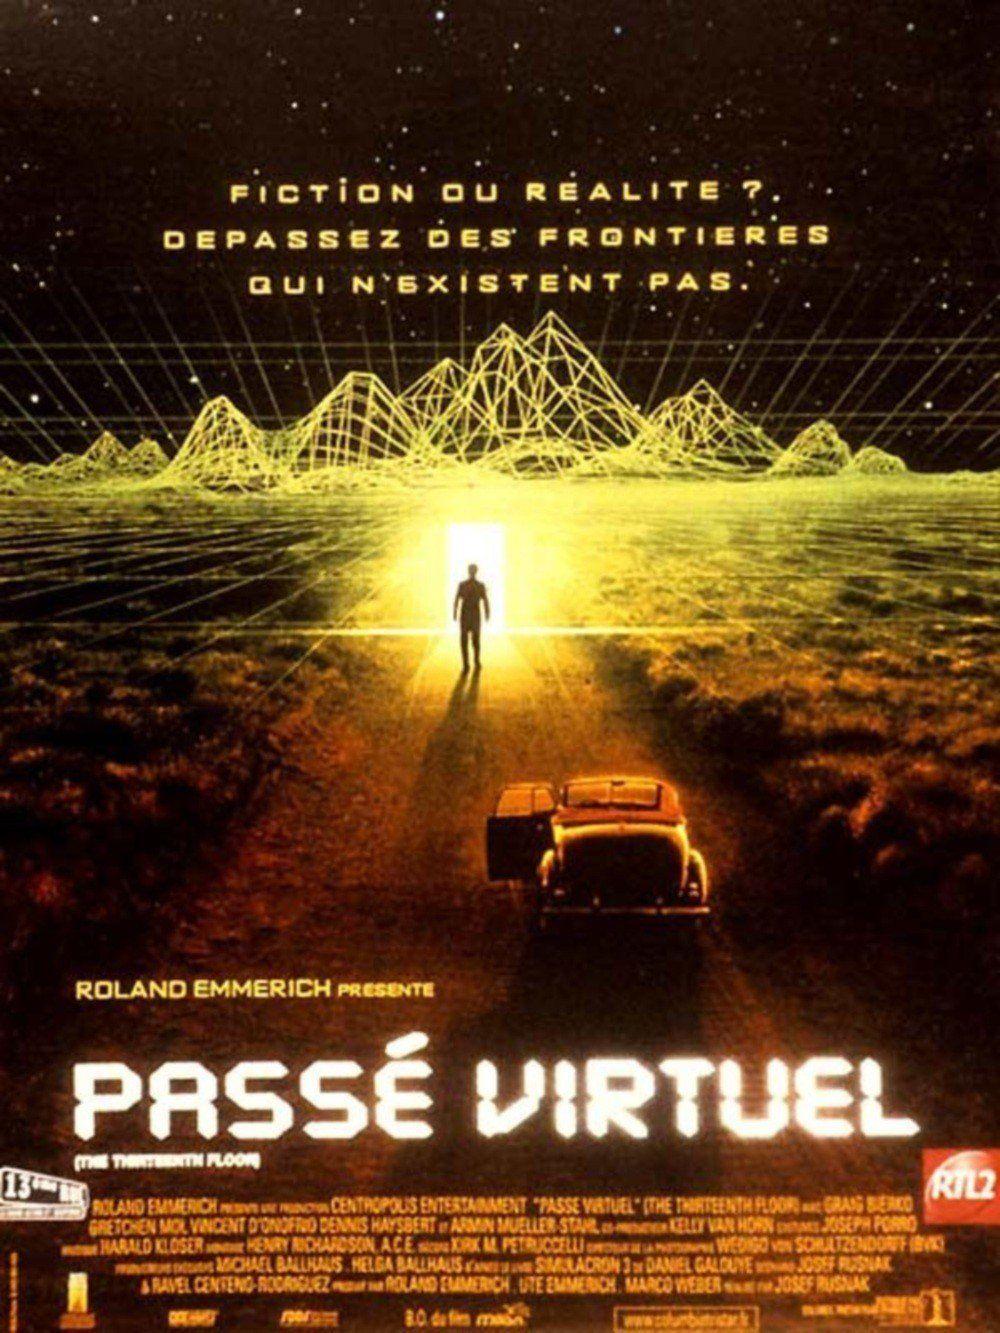 Passe_virtuel.jpg